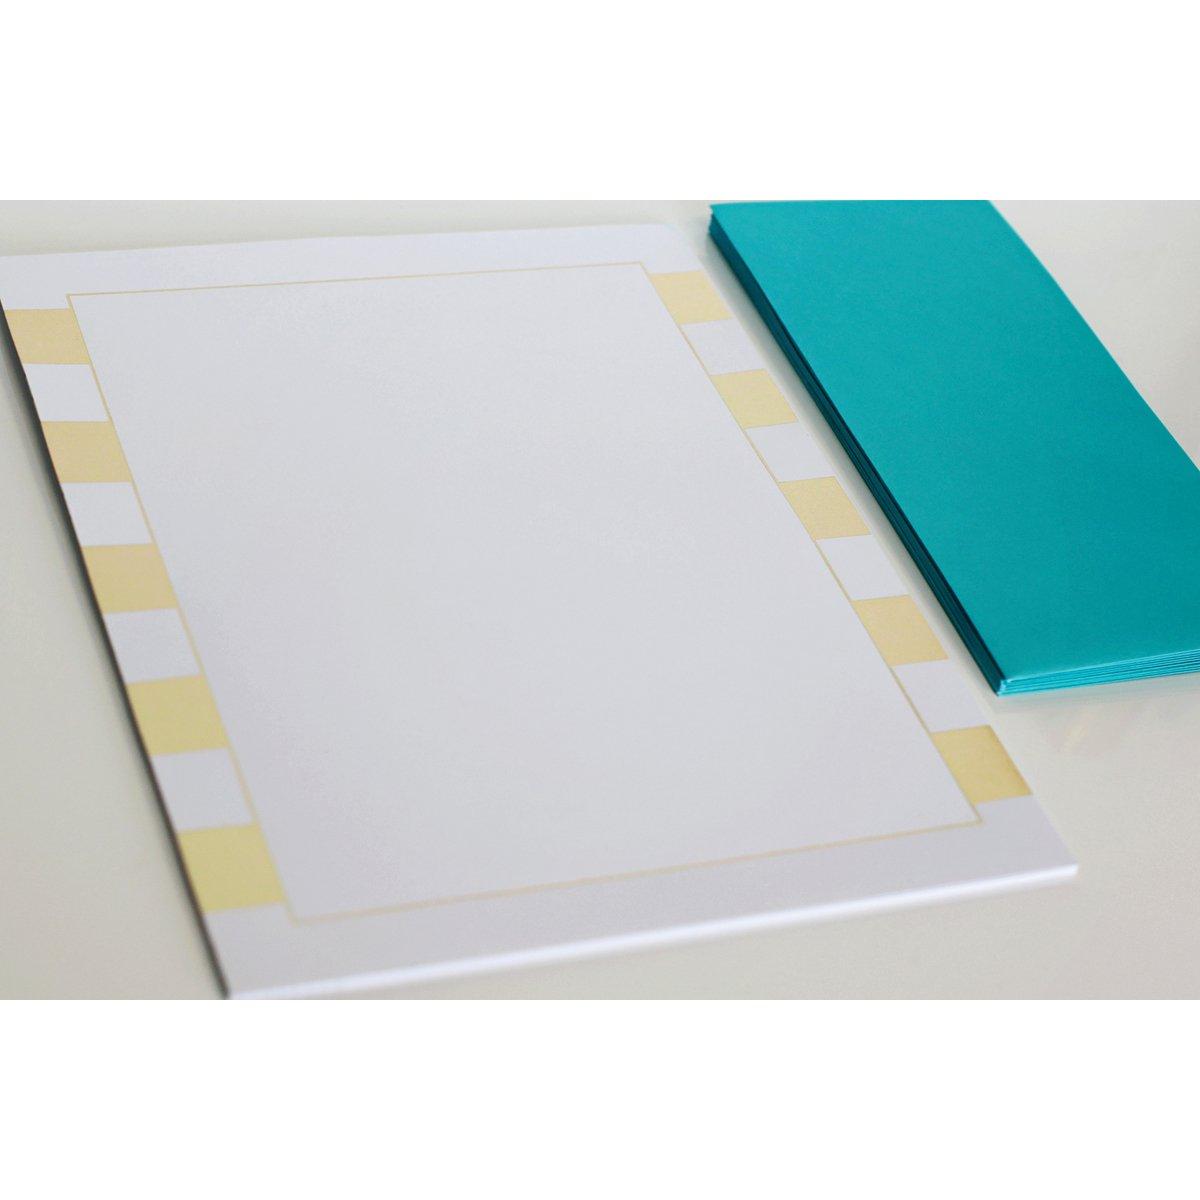 Studio Gold Foiled Stationery 8.5X11 12/Pkg-Stripes